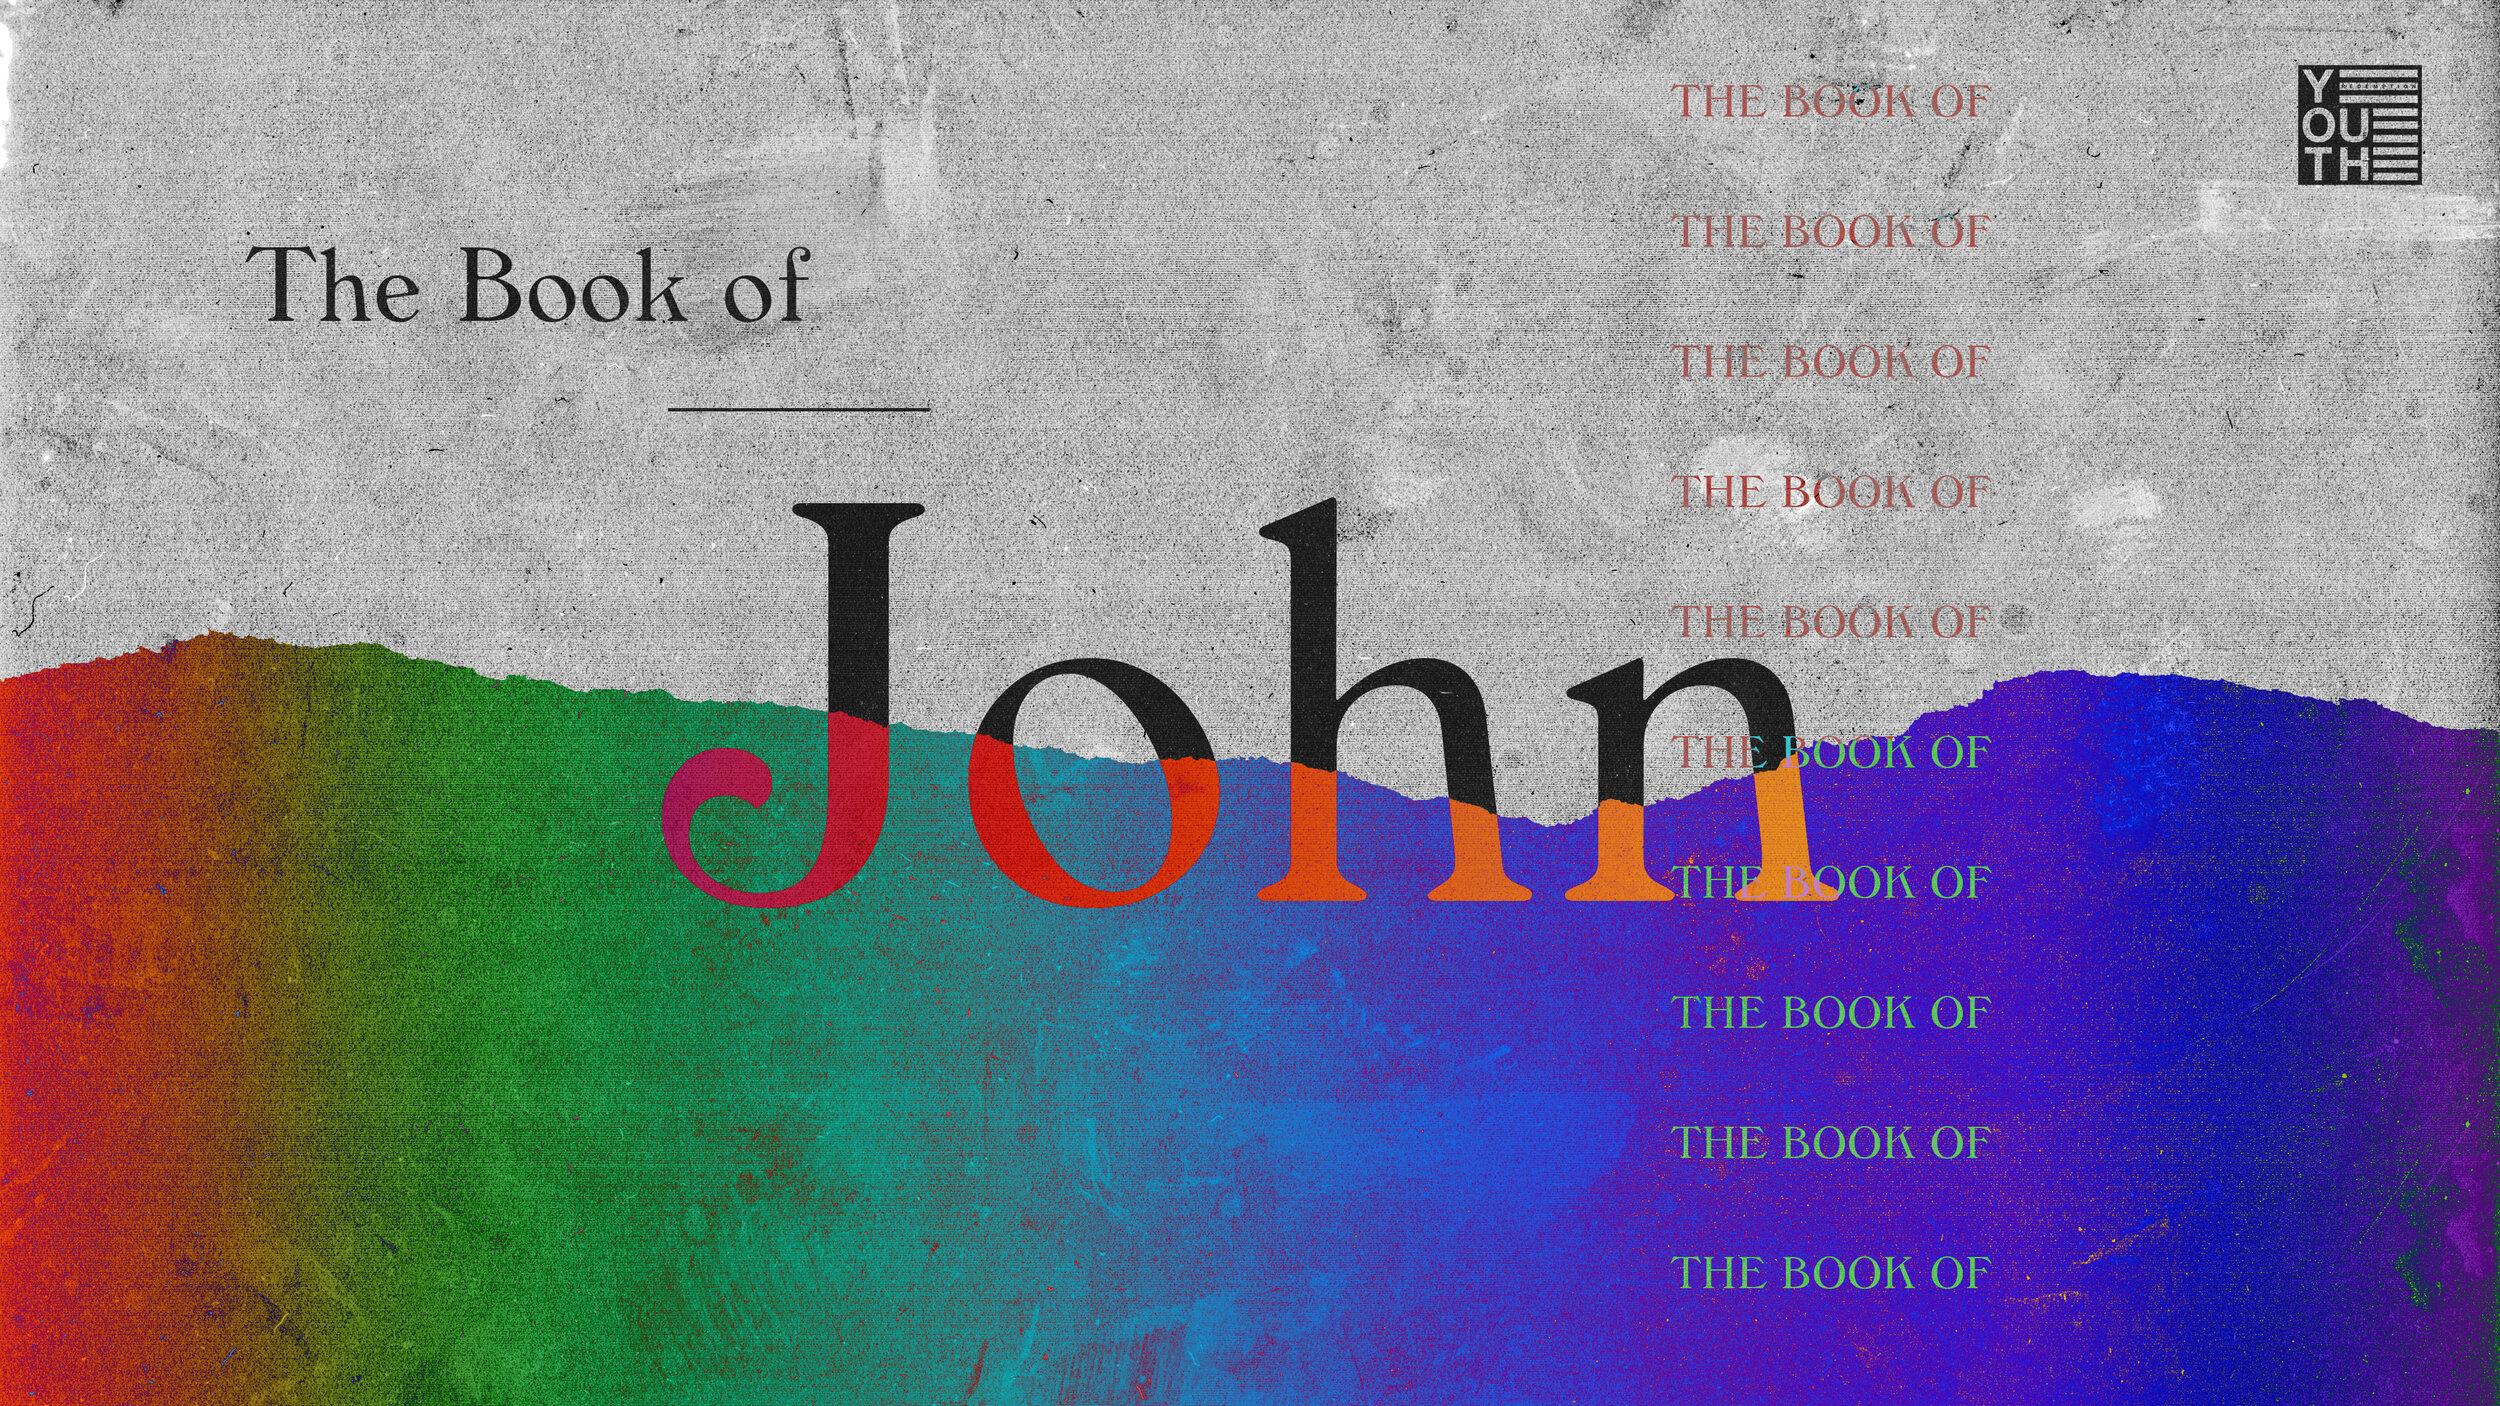 TheBookofJohn_RedemptionYouth_v.01Main_Graphic.jpg